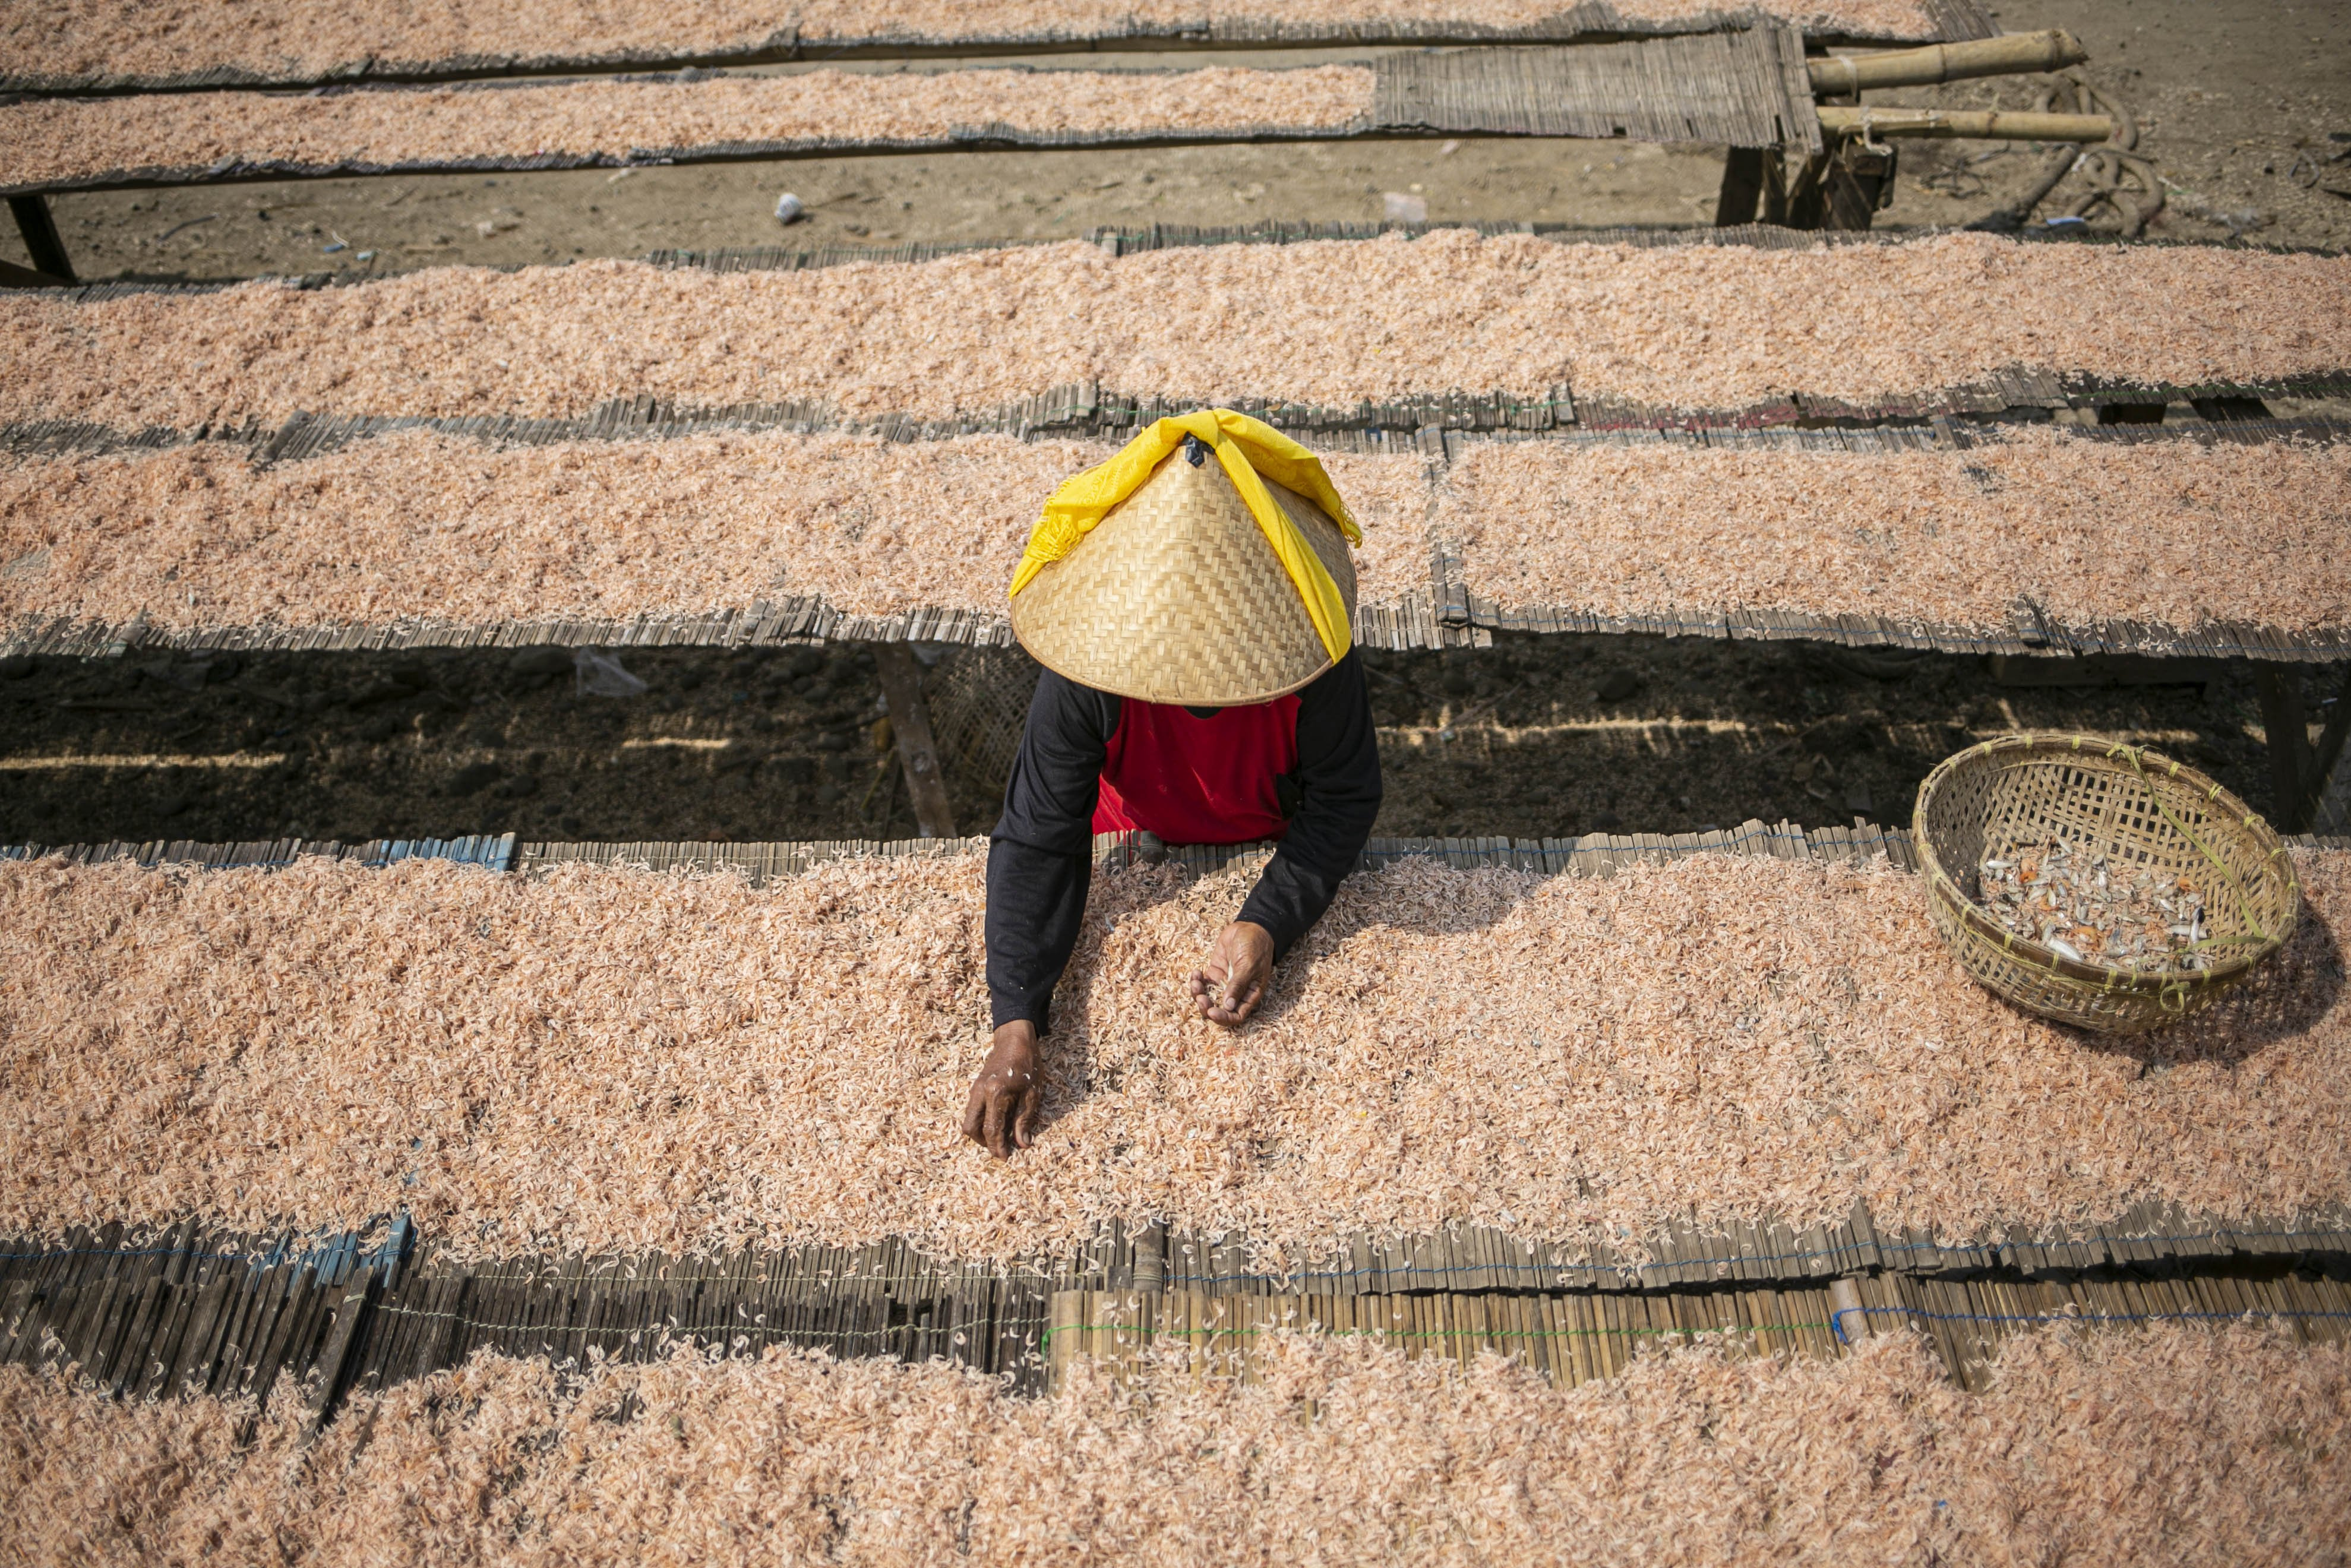 Warga menjemur ikan di Kampung Nelayan, Jakarta Utara, Minggu (9/8/2020). Kesatuan Nelayan Tradisional Indonesia (KNTI) mengklaim penurunan penjualan tangkapan nelayan mencapai 21 persen dan pendapatan hingga 90 persen akibat merebaknya virus covid-19.